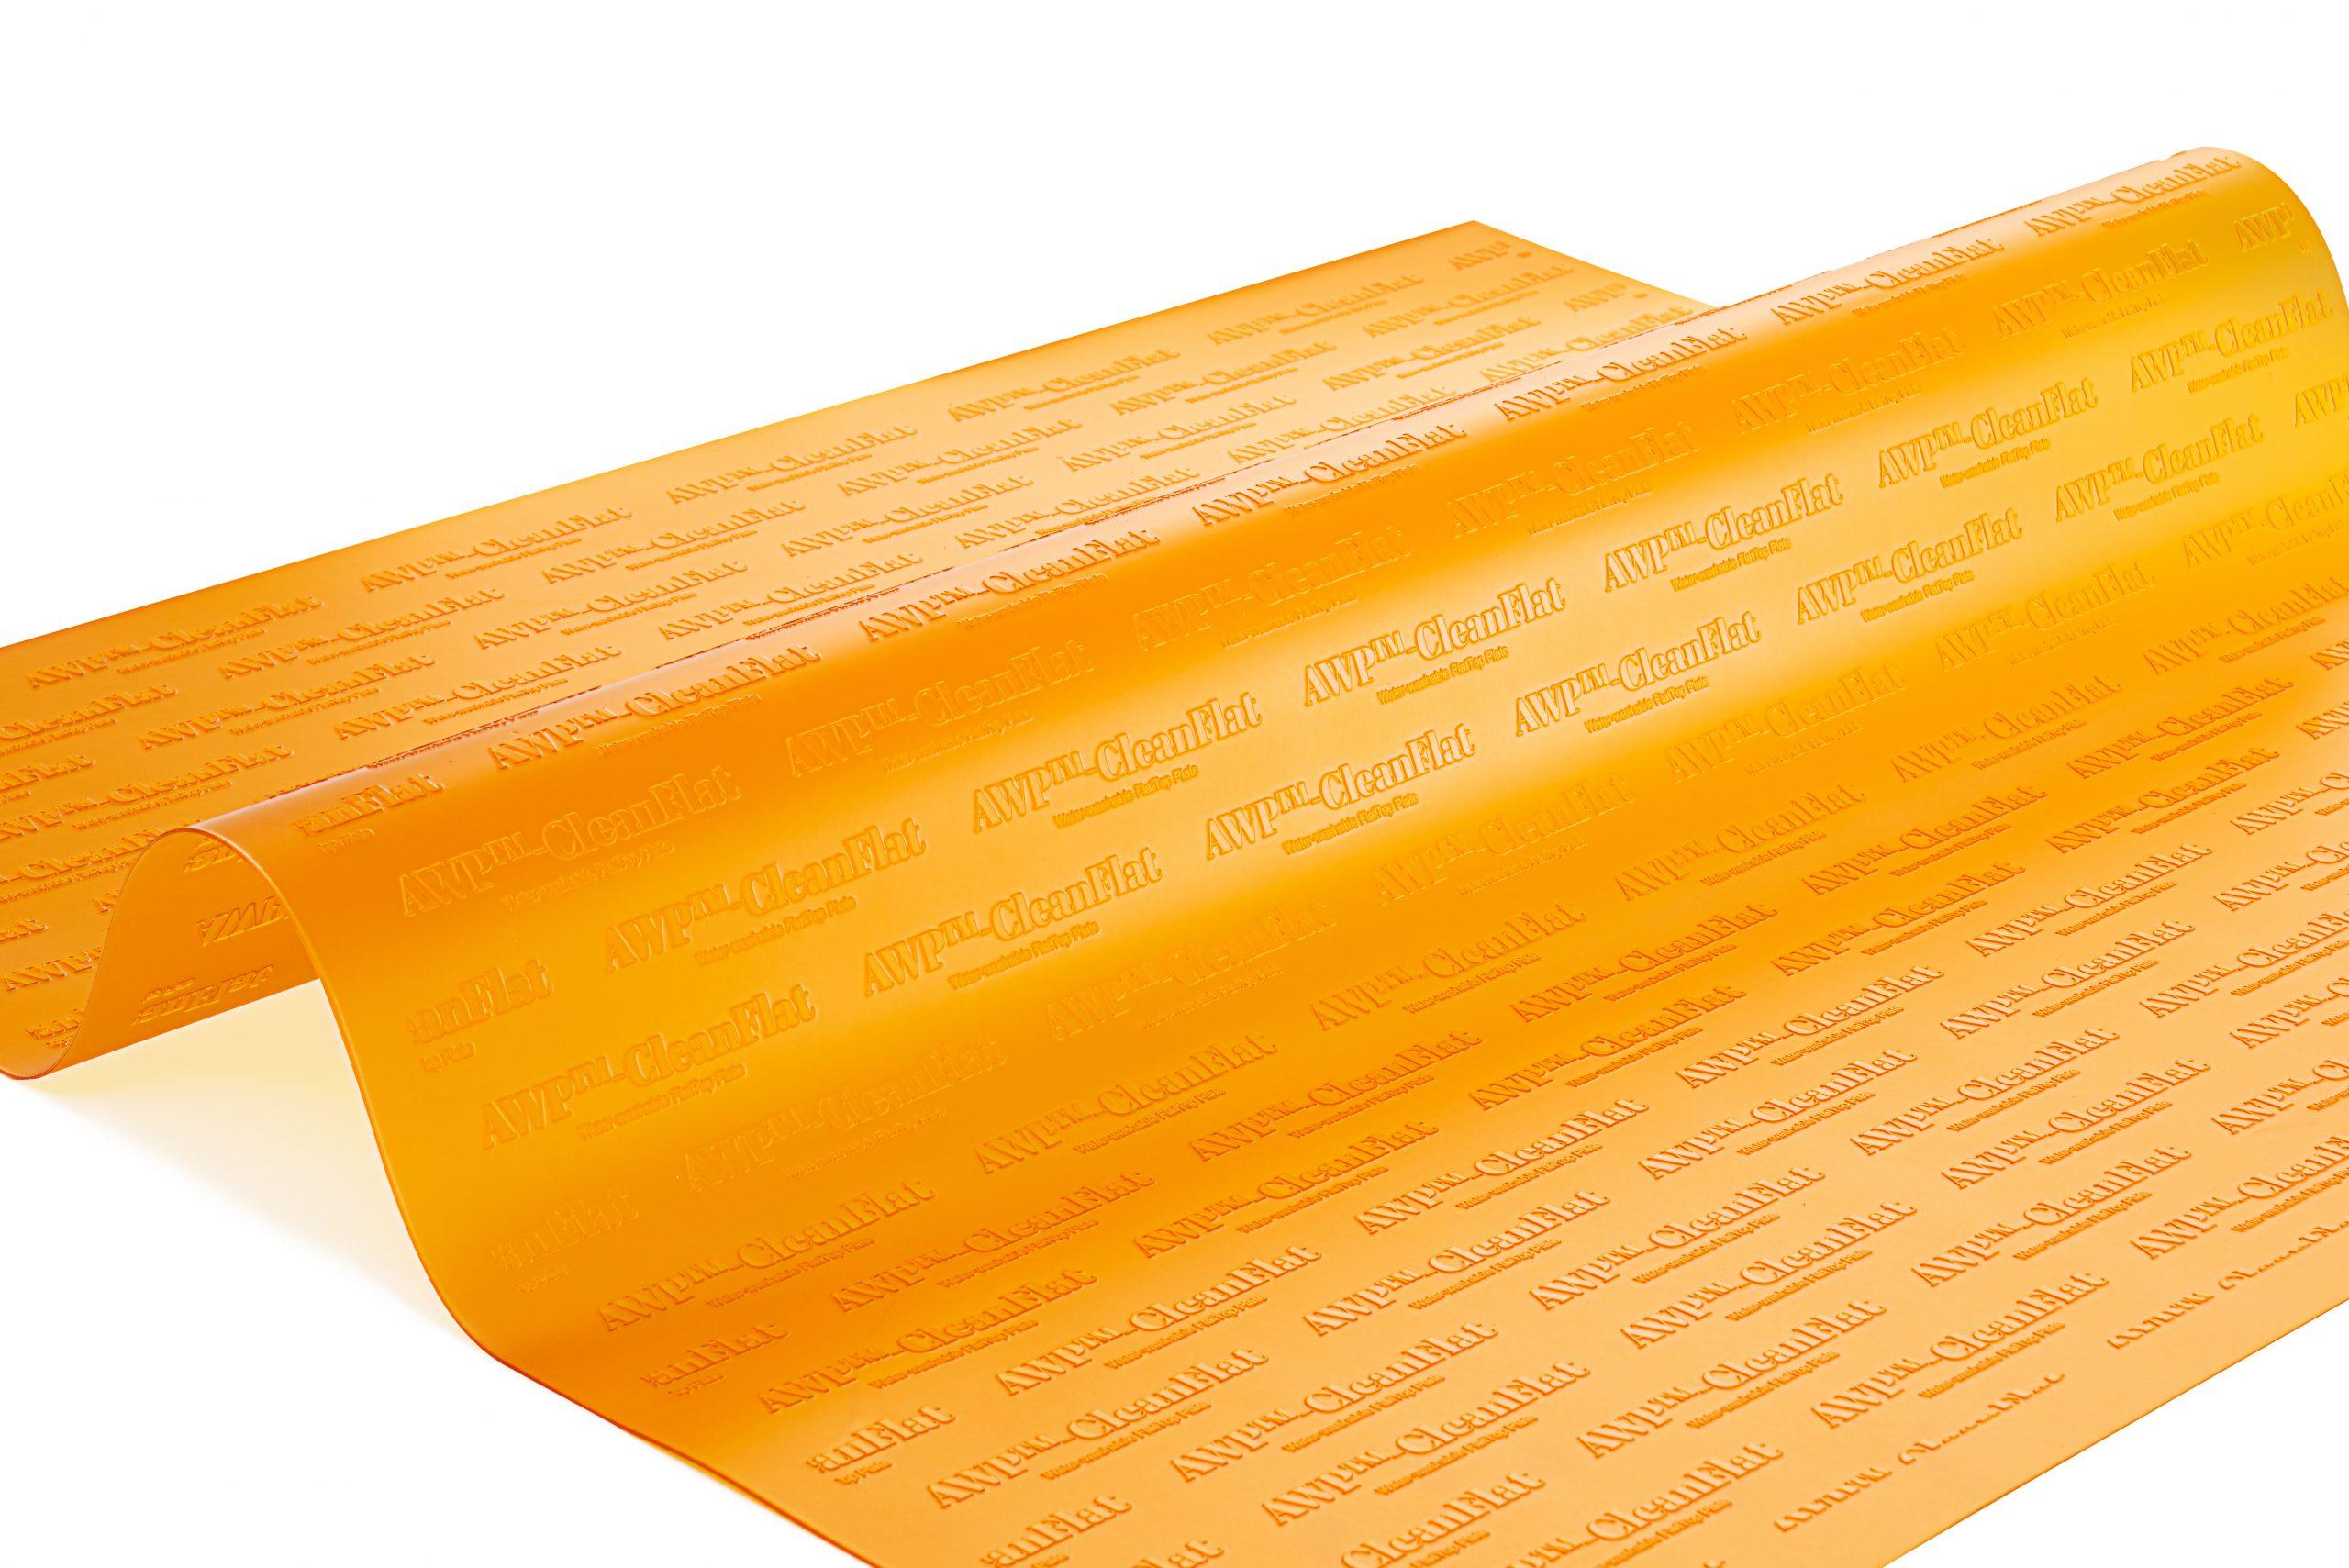 AWP CleanFlat plate (orange)